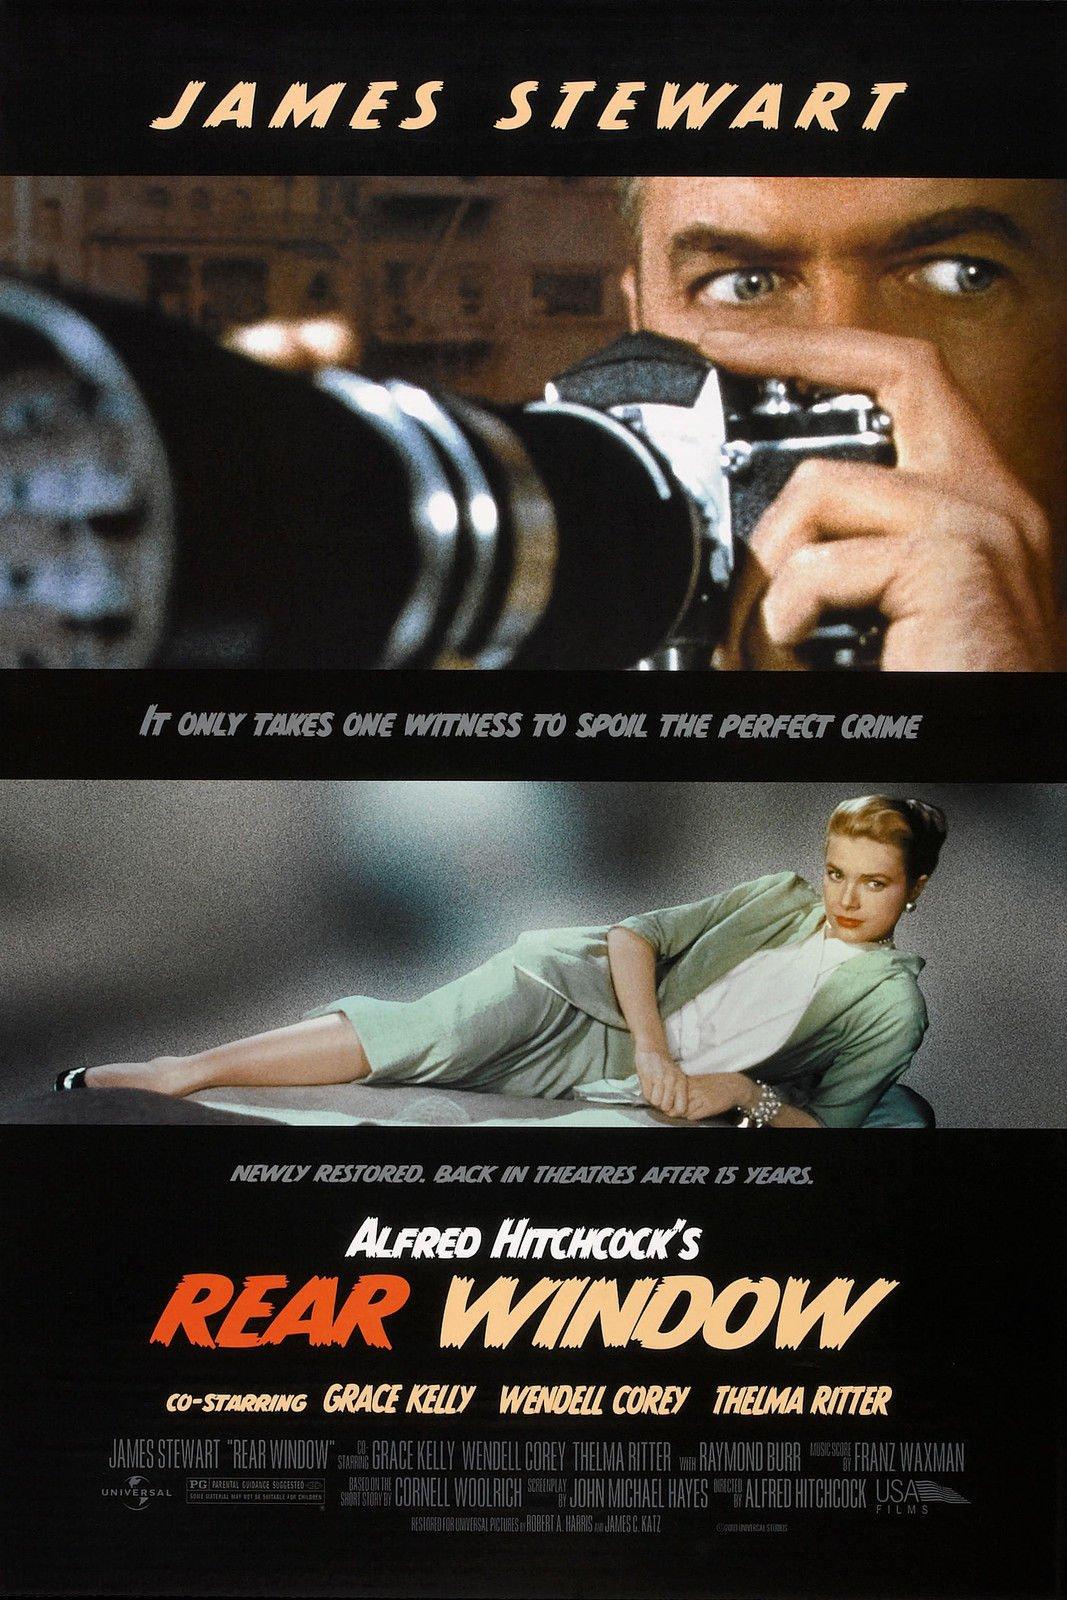 Rear Window (1954) Movie Poster 24''x36''